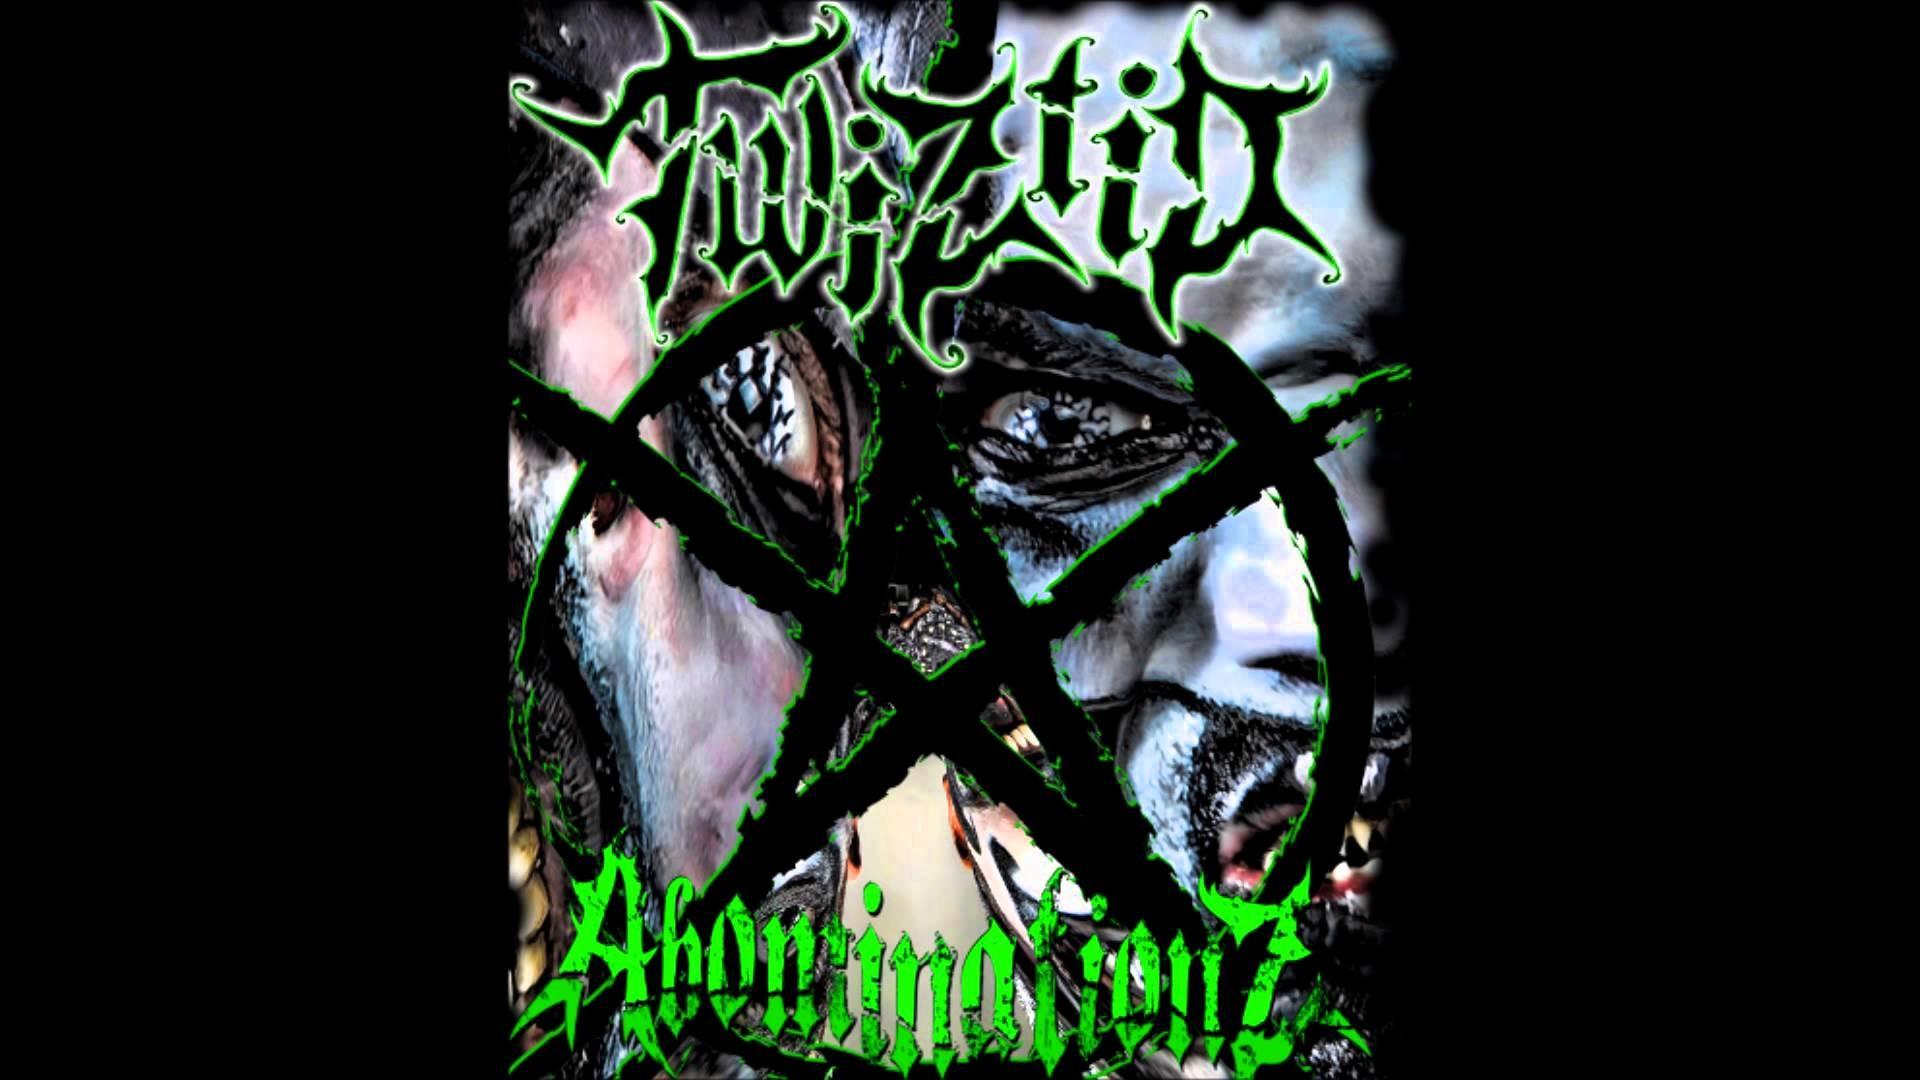 Twiztid – Monstrosity (ft. The R.O.C., ABK & Aqualeo) (REMIX .